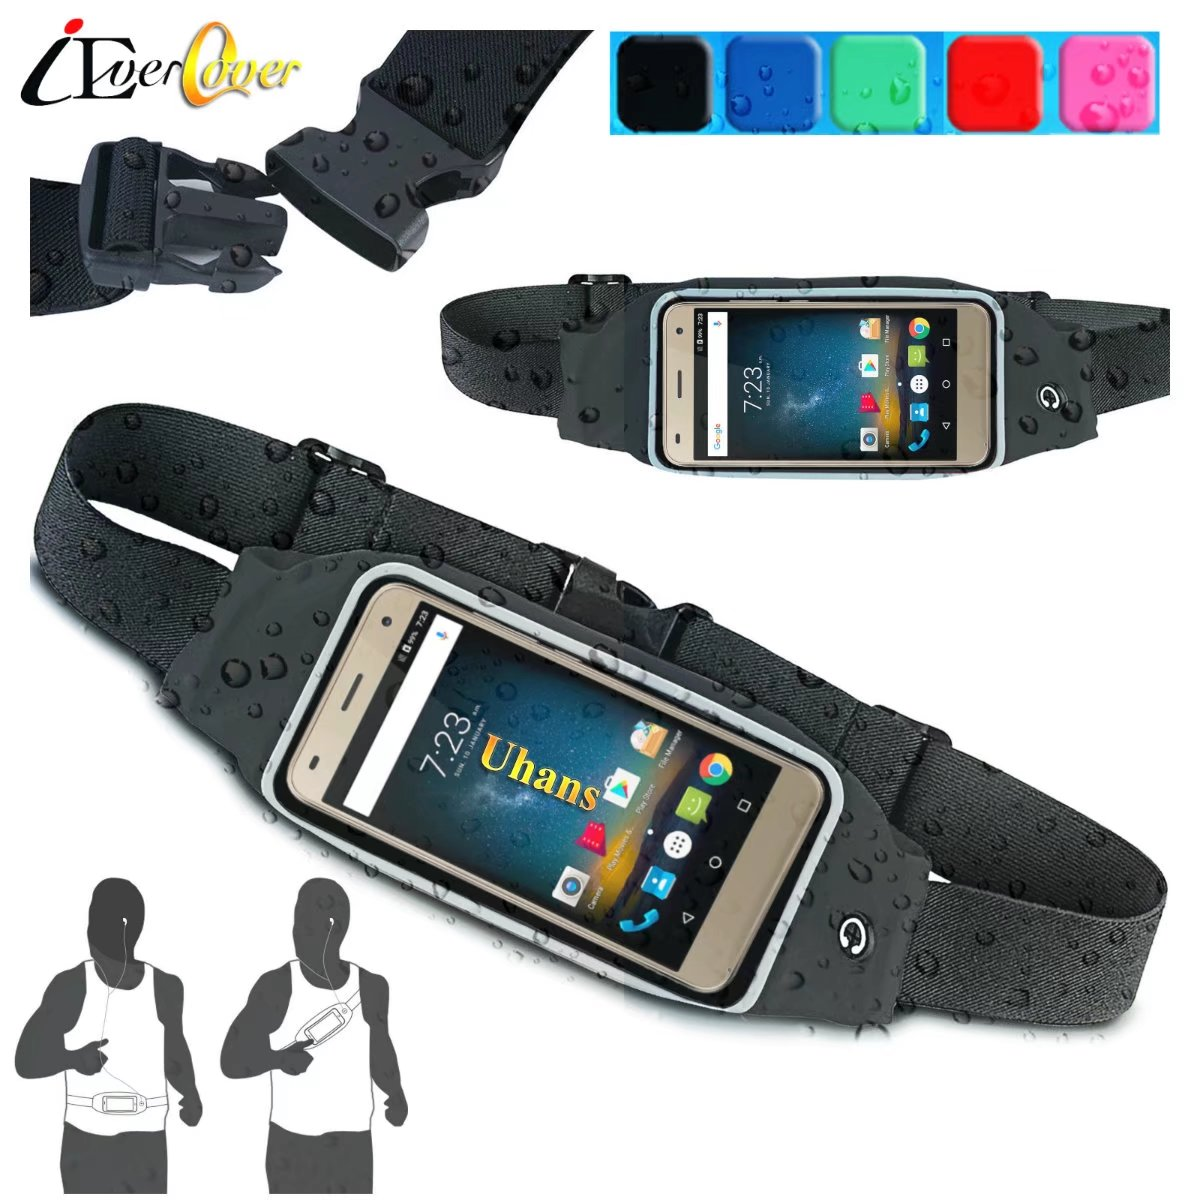 Waterproof Sport Running Fitness Pouch Cover Case for Uhans U300 , Note 4 , A6 Phone Waist Bag Band Capa Fundas pochette étanche pour téléphone